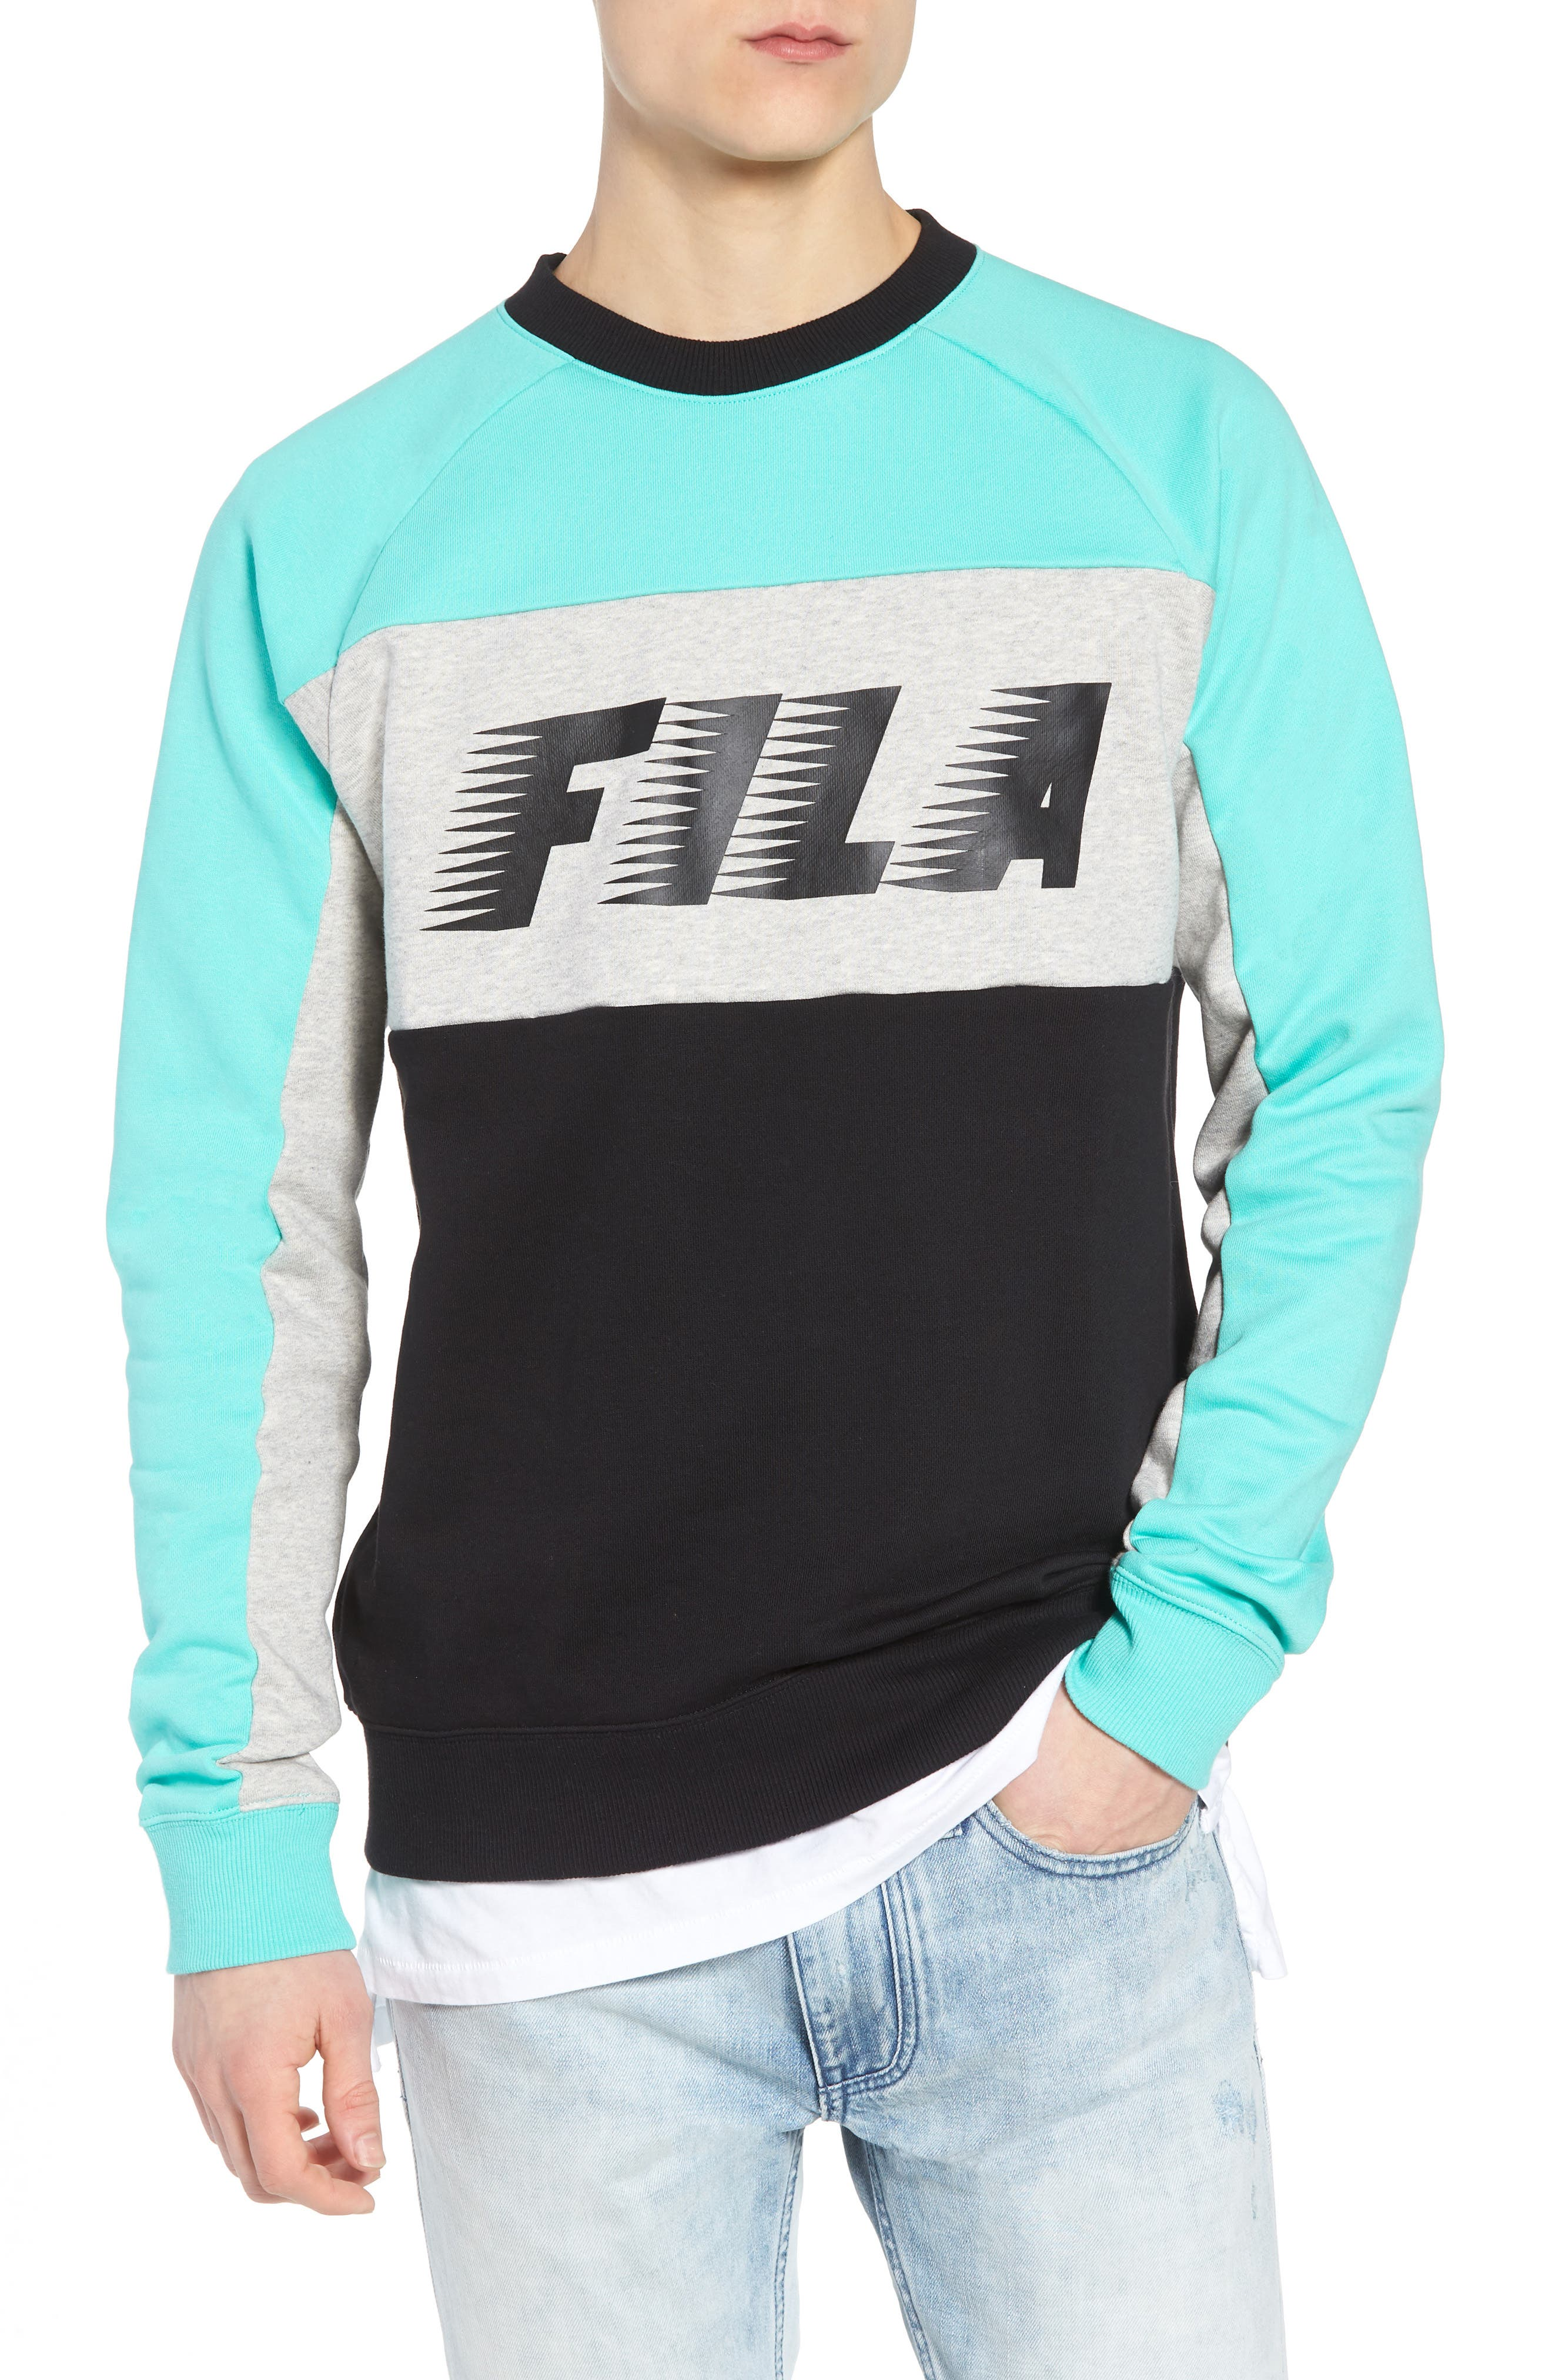 Layton Sweatshirt,                             Main thumbnail 1, color,                             Black/ Cockatoo/ Grey Marl